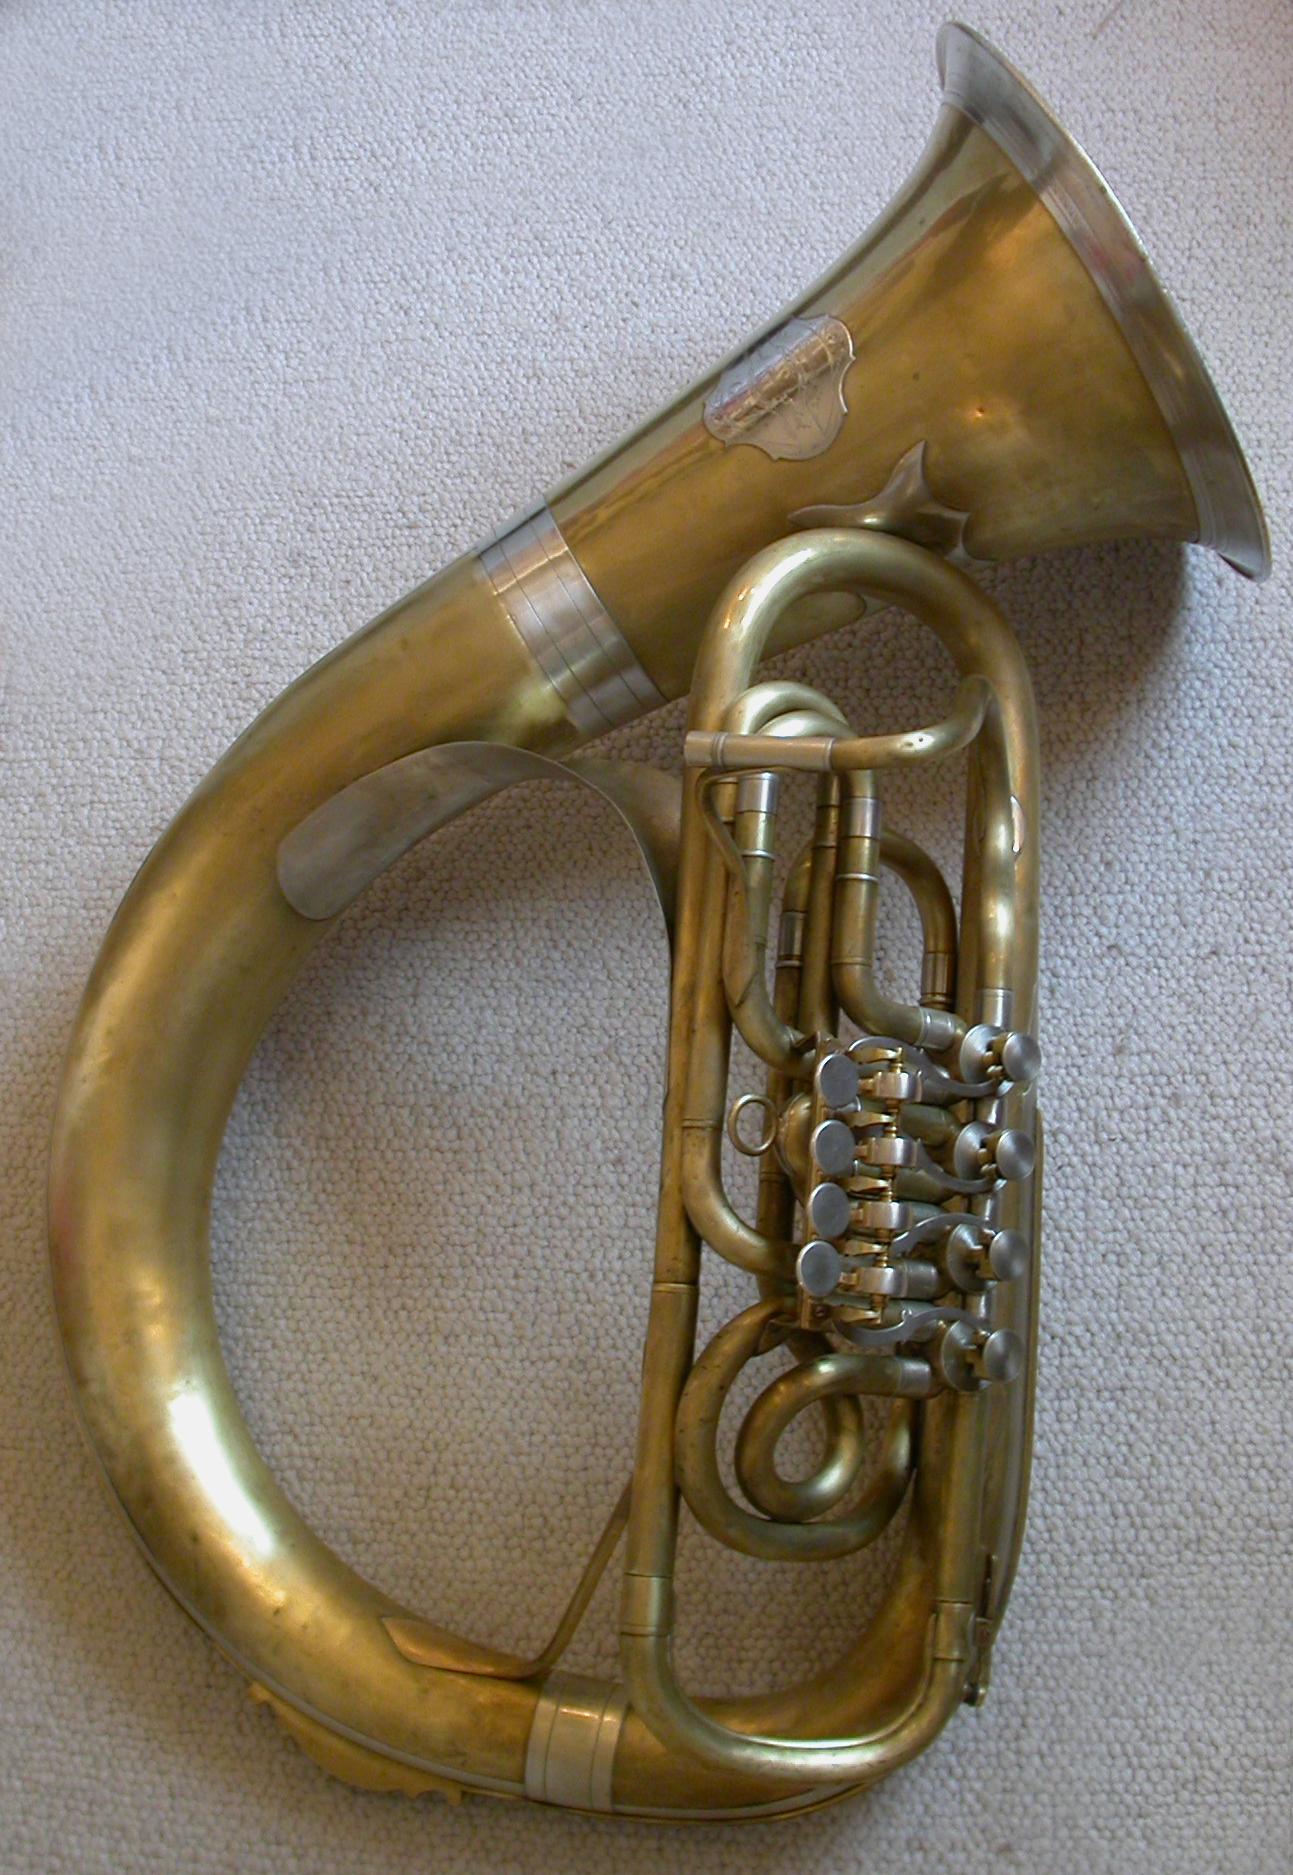 Helicon (instrument) - Wikipedia